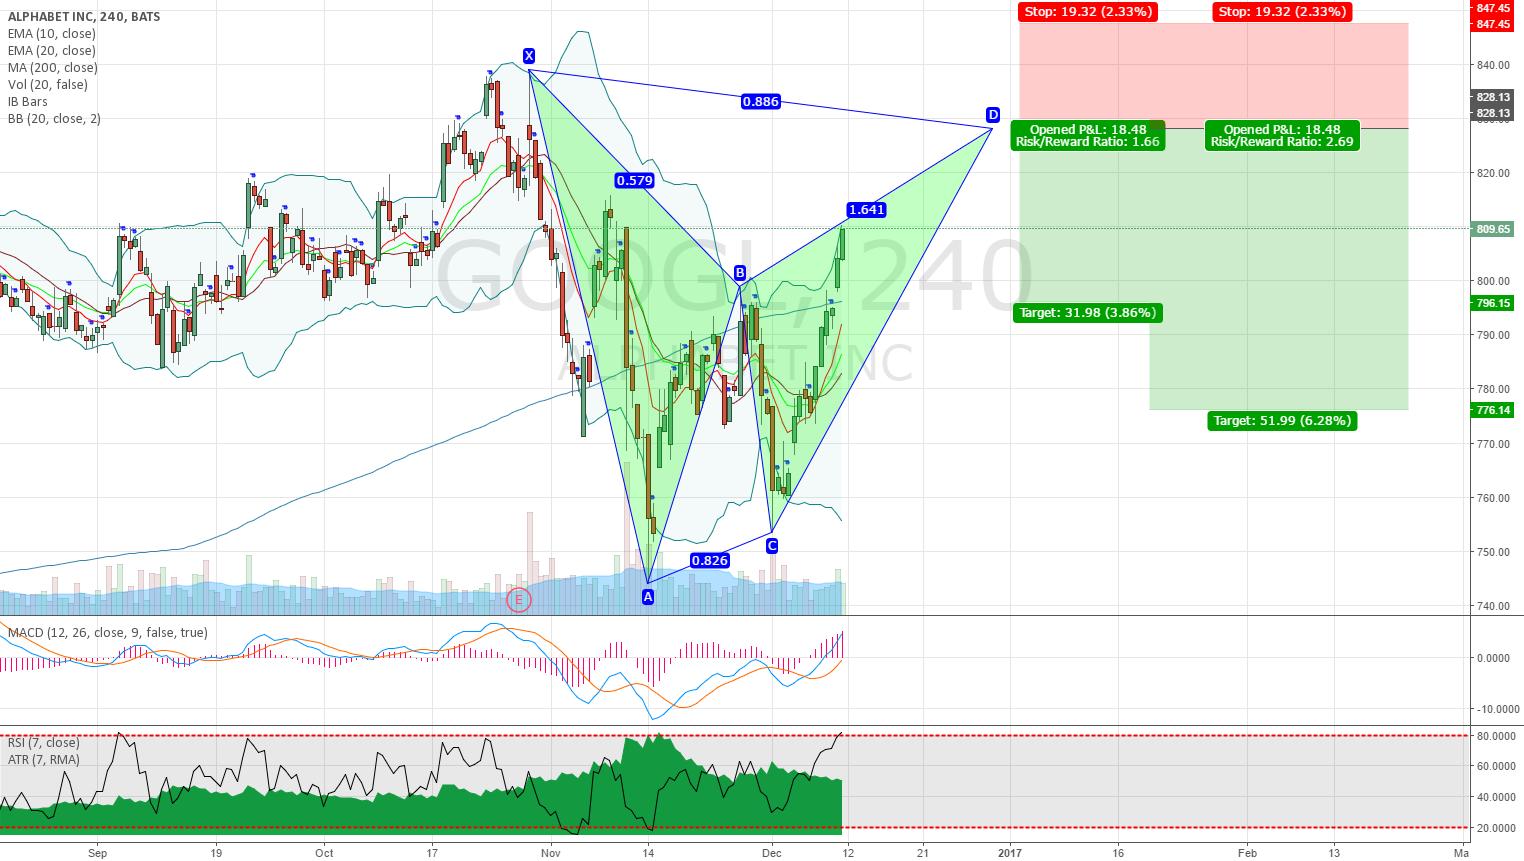 GOOGL Alphabet potential bearish bat pattern on 4H chart